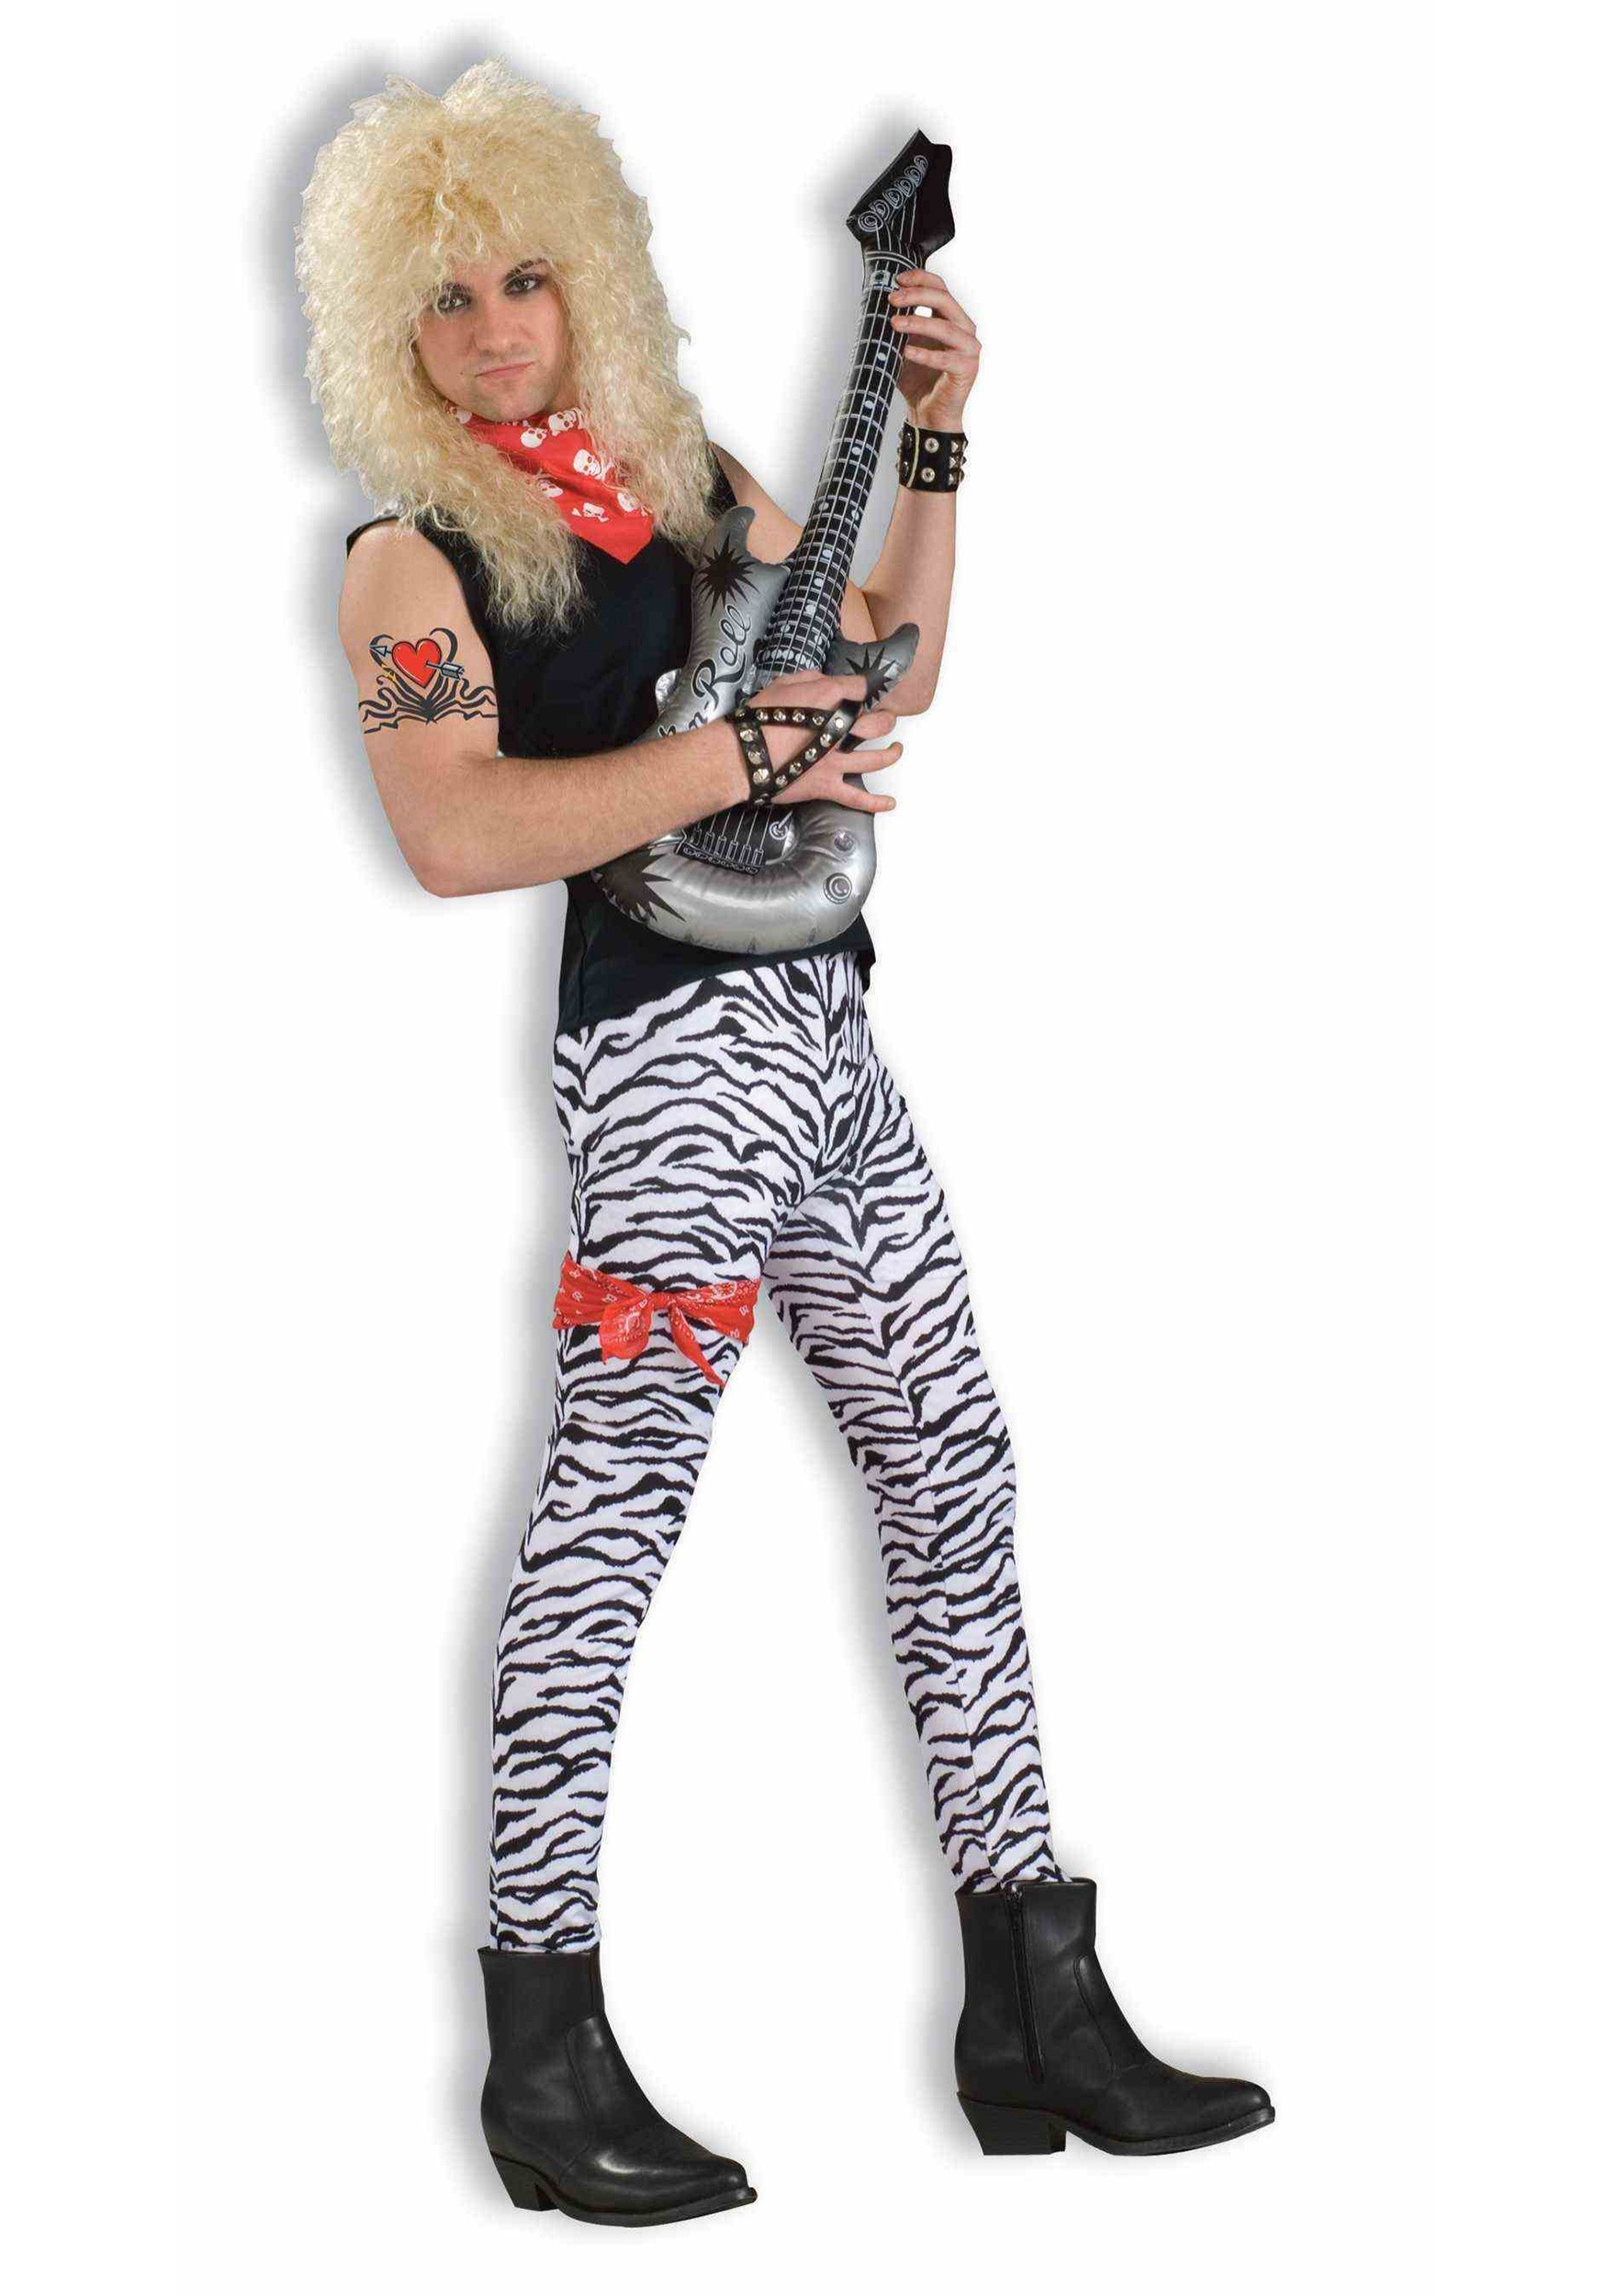 Adult Men/'s 80s Heavy Metal Rock Halloween Cosplay Costume Spandex Stretch Pants